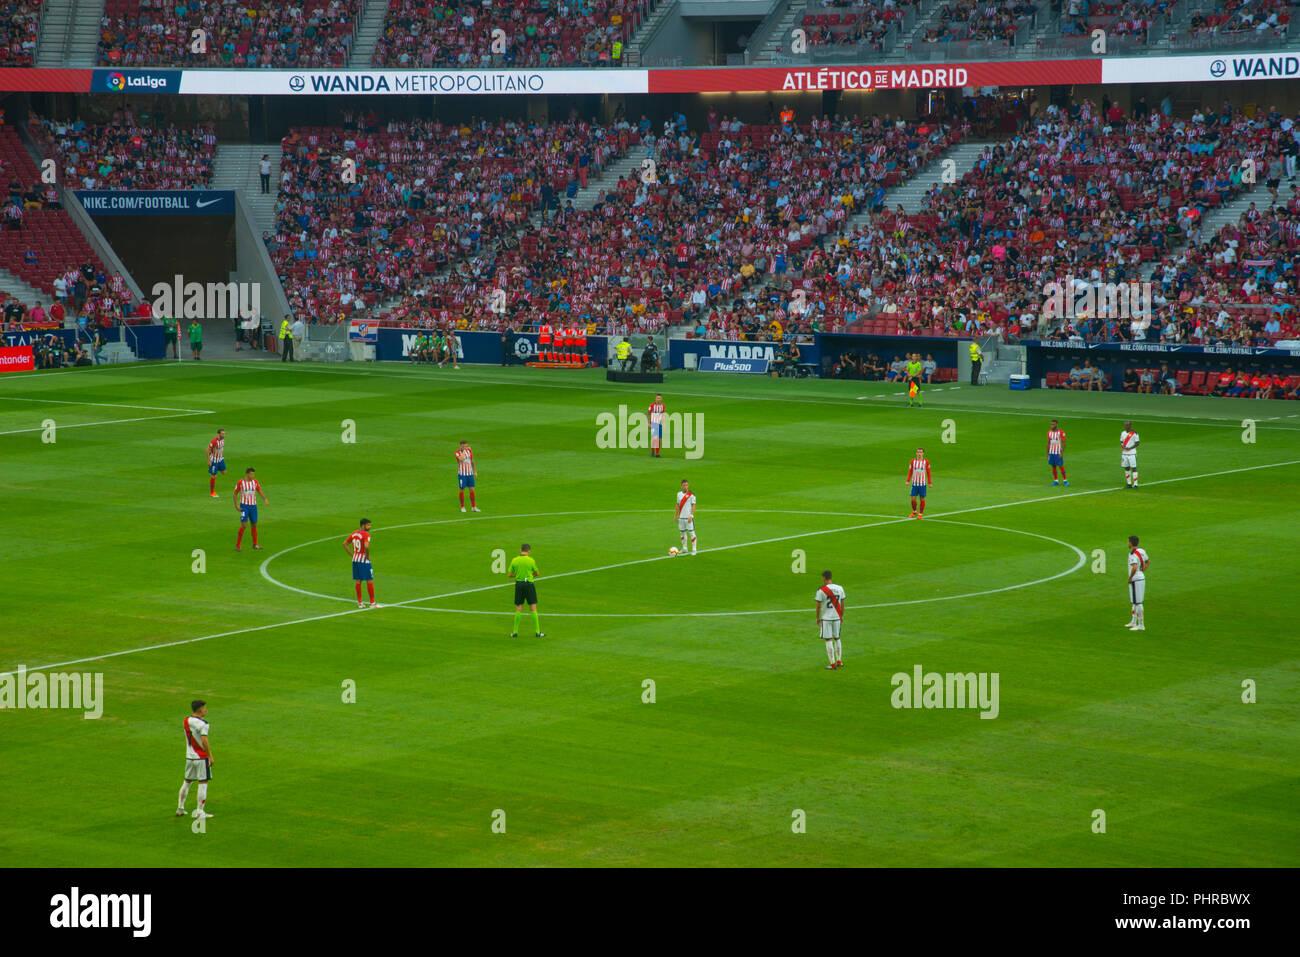 Football match, initial moment. Wanda Metropolitano Stadium, Madrid, Spain. - Stock Image